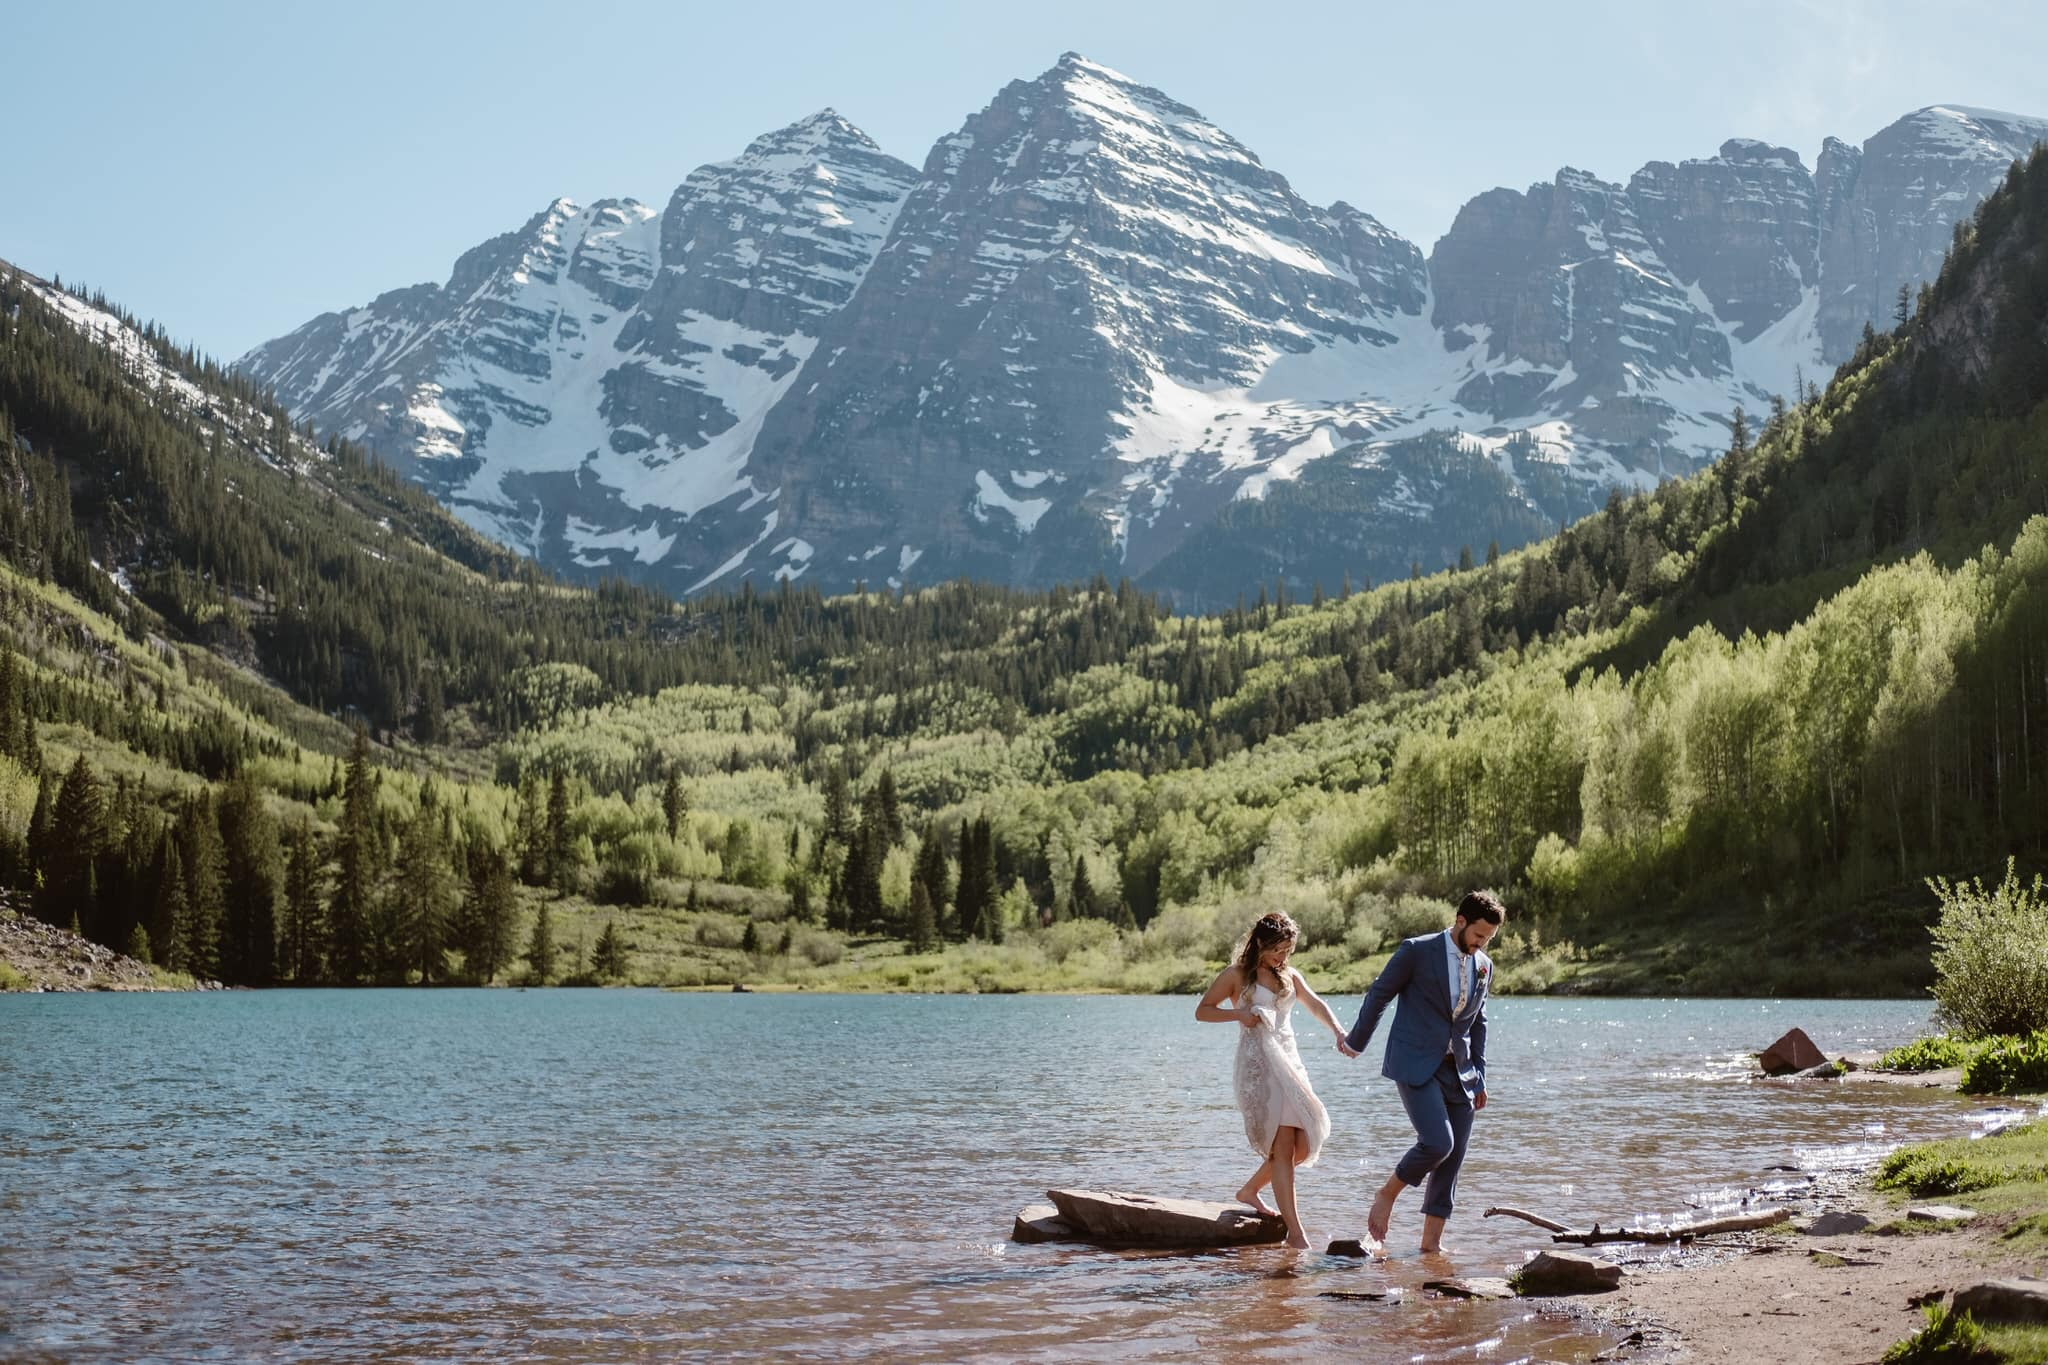 Destination adventure wedding photography rocky mountain national park